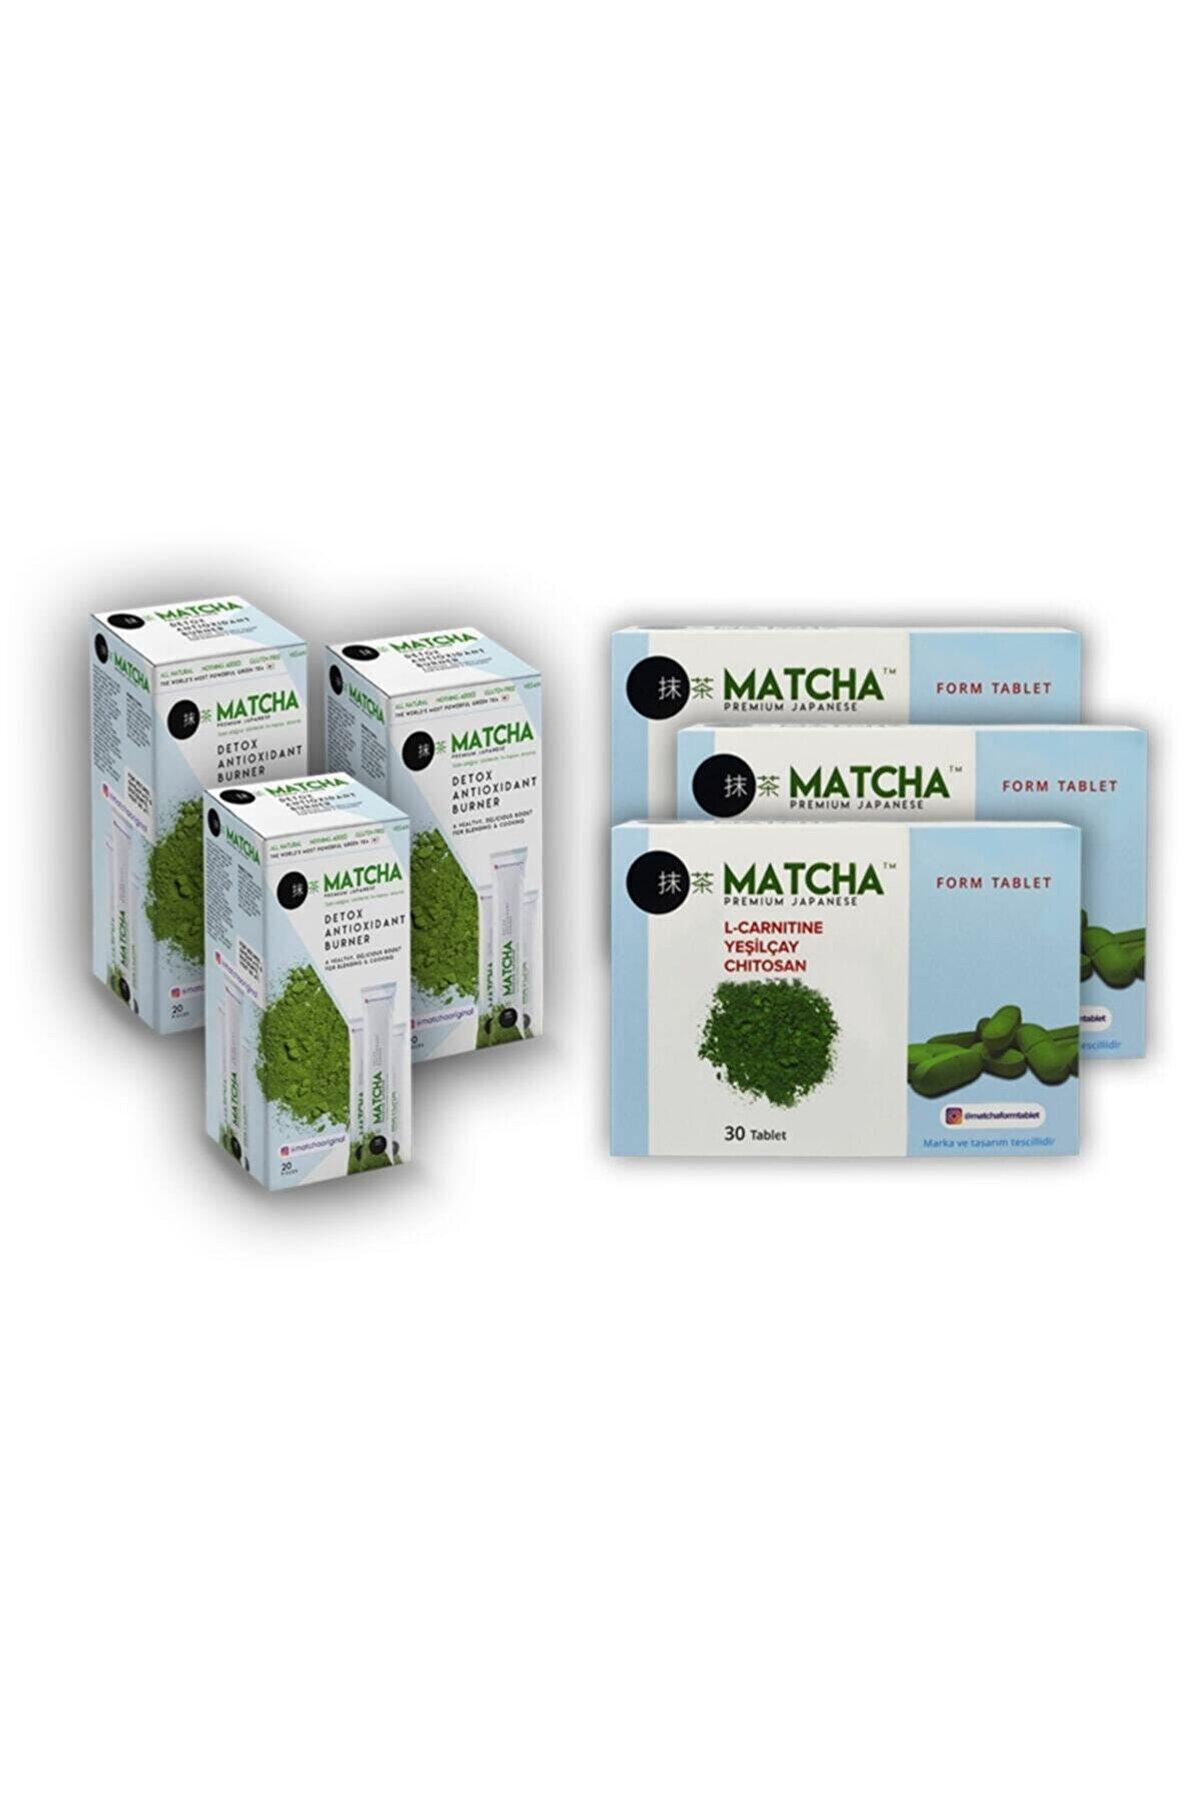 Bilge İlaç Matcha Çayı X Matcha Form Tablet 3'lü Mix Paket